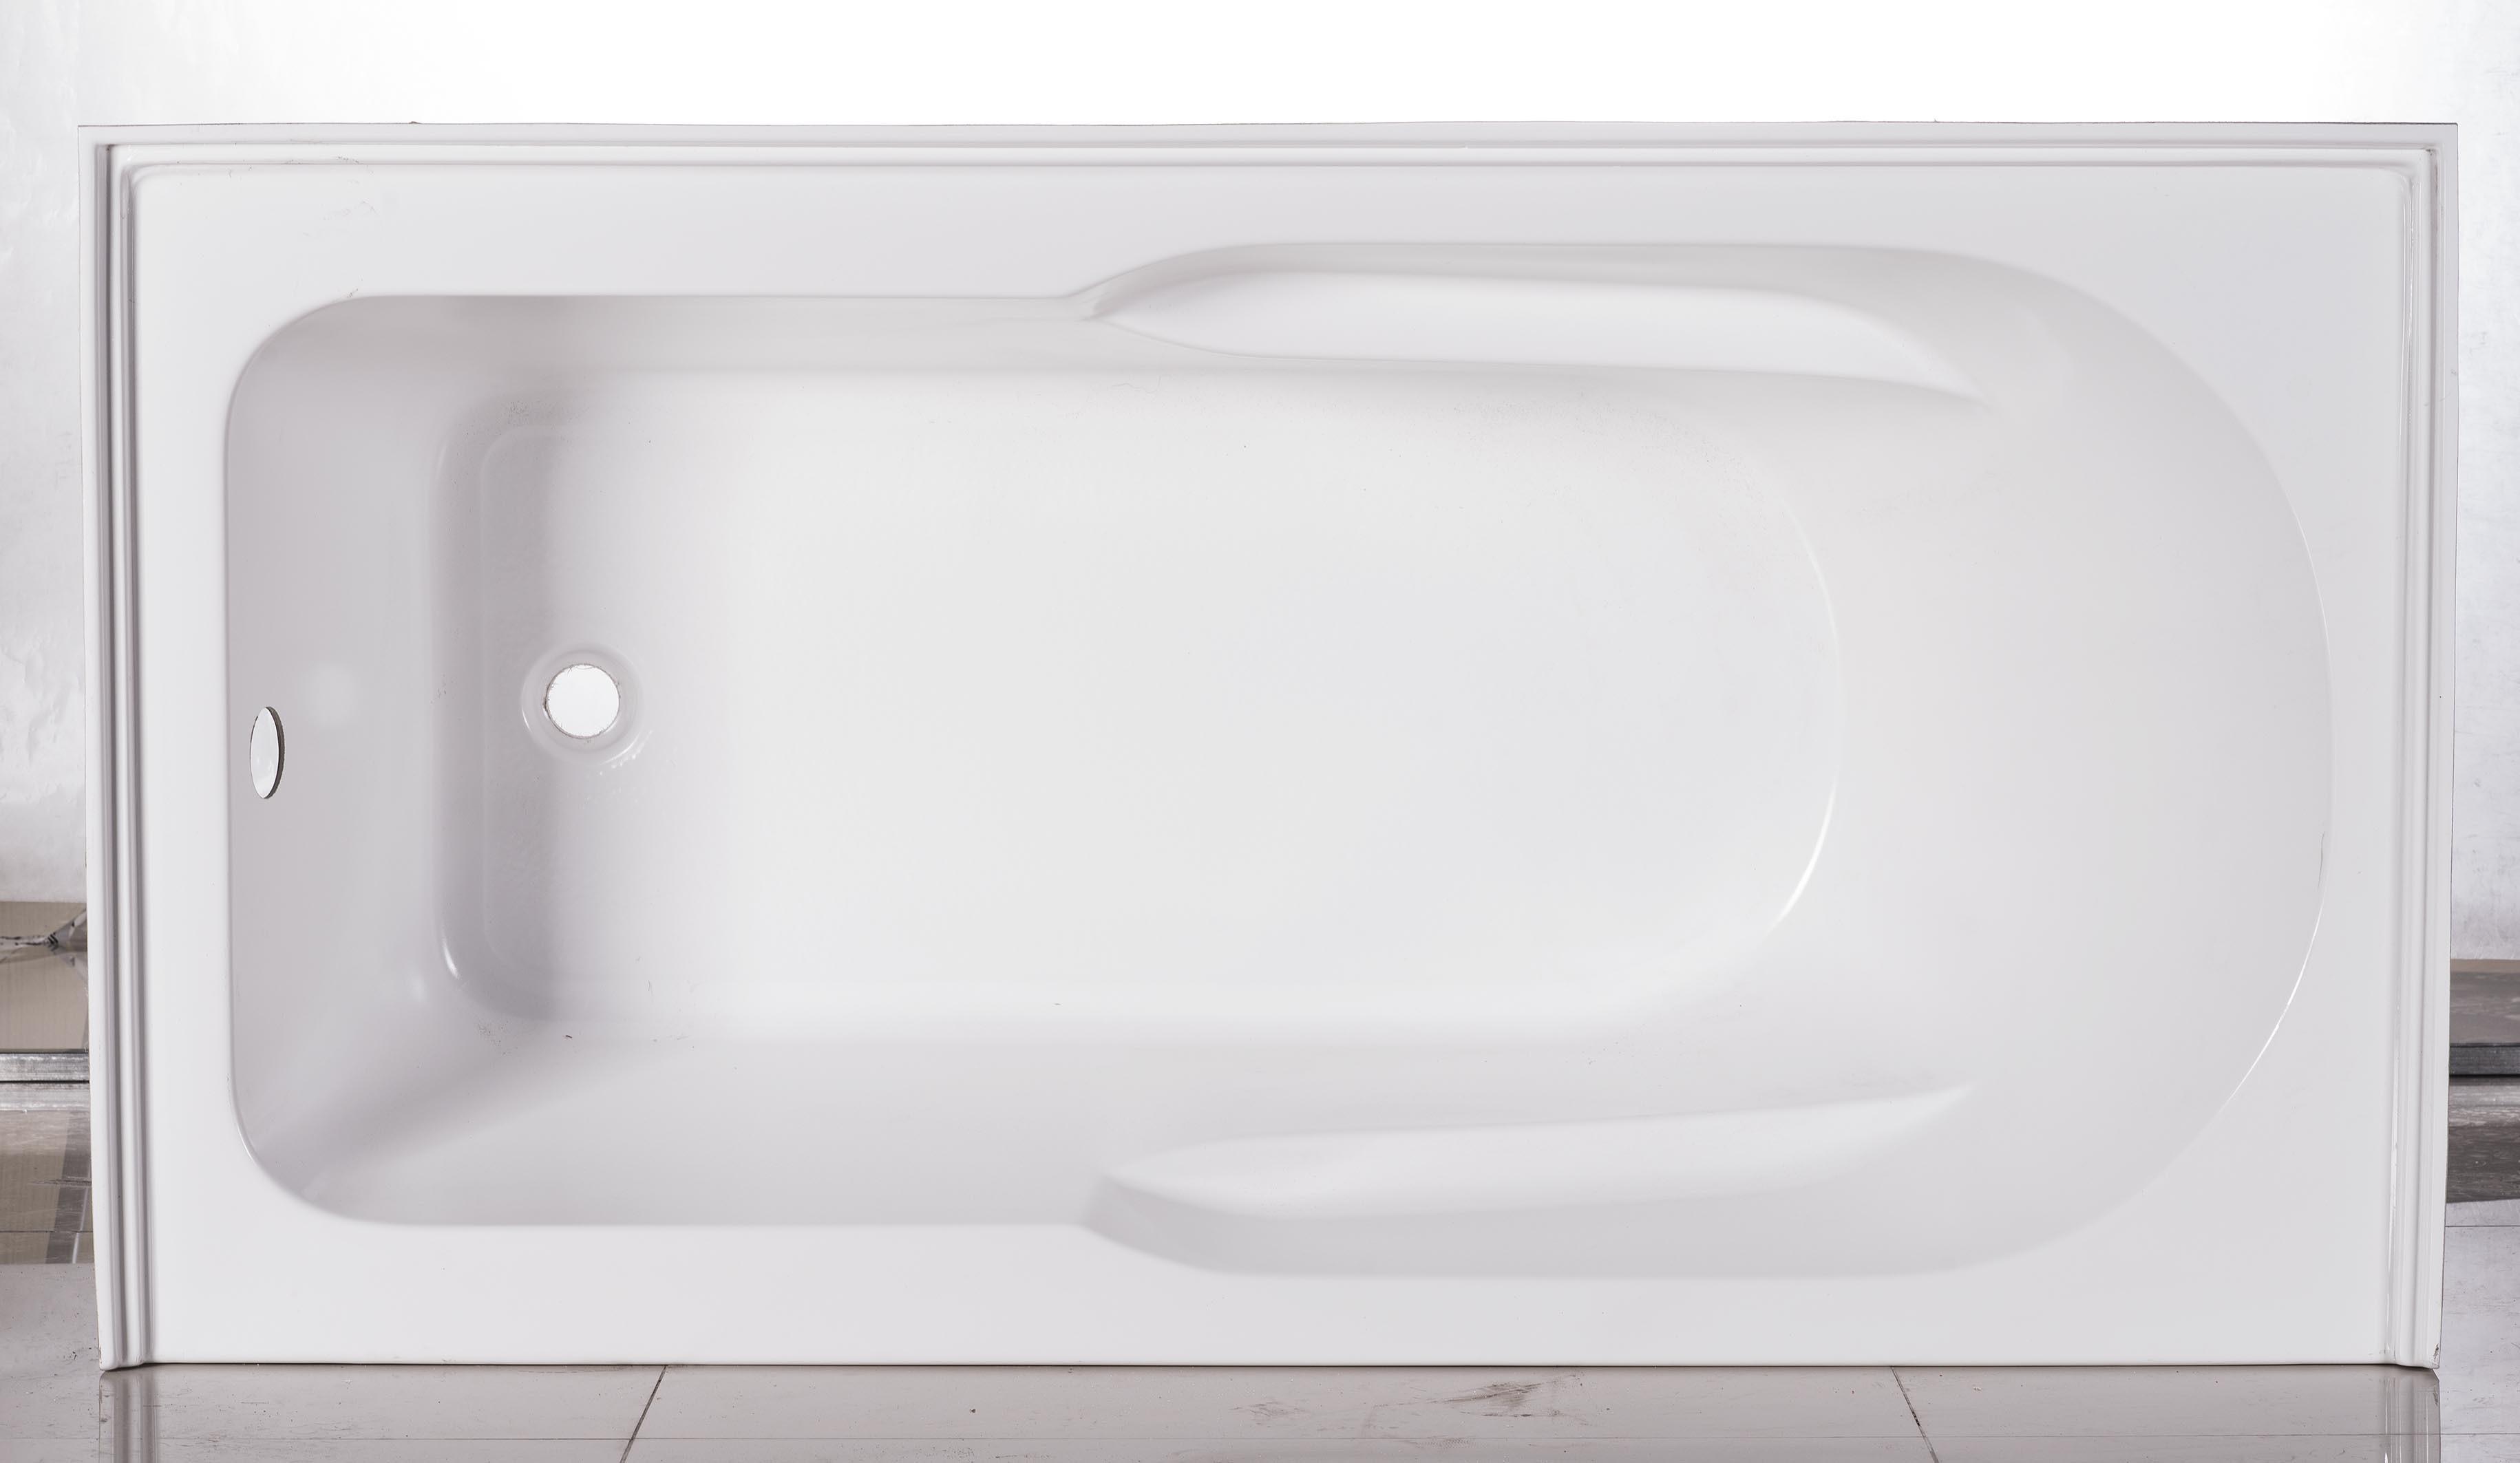 China Cupc Alcove Skirt Bathtub with Tile Flange 60\